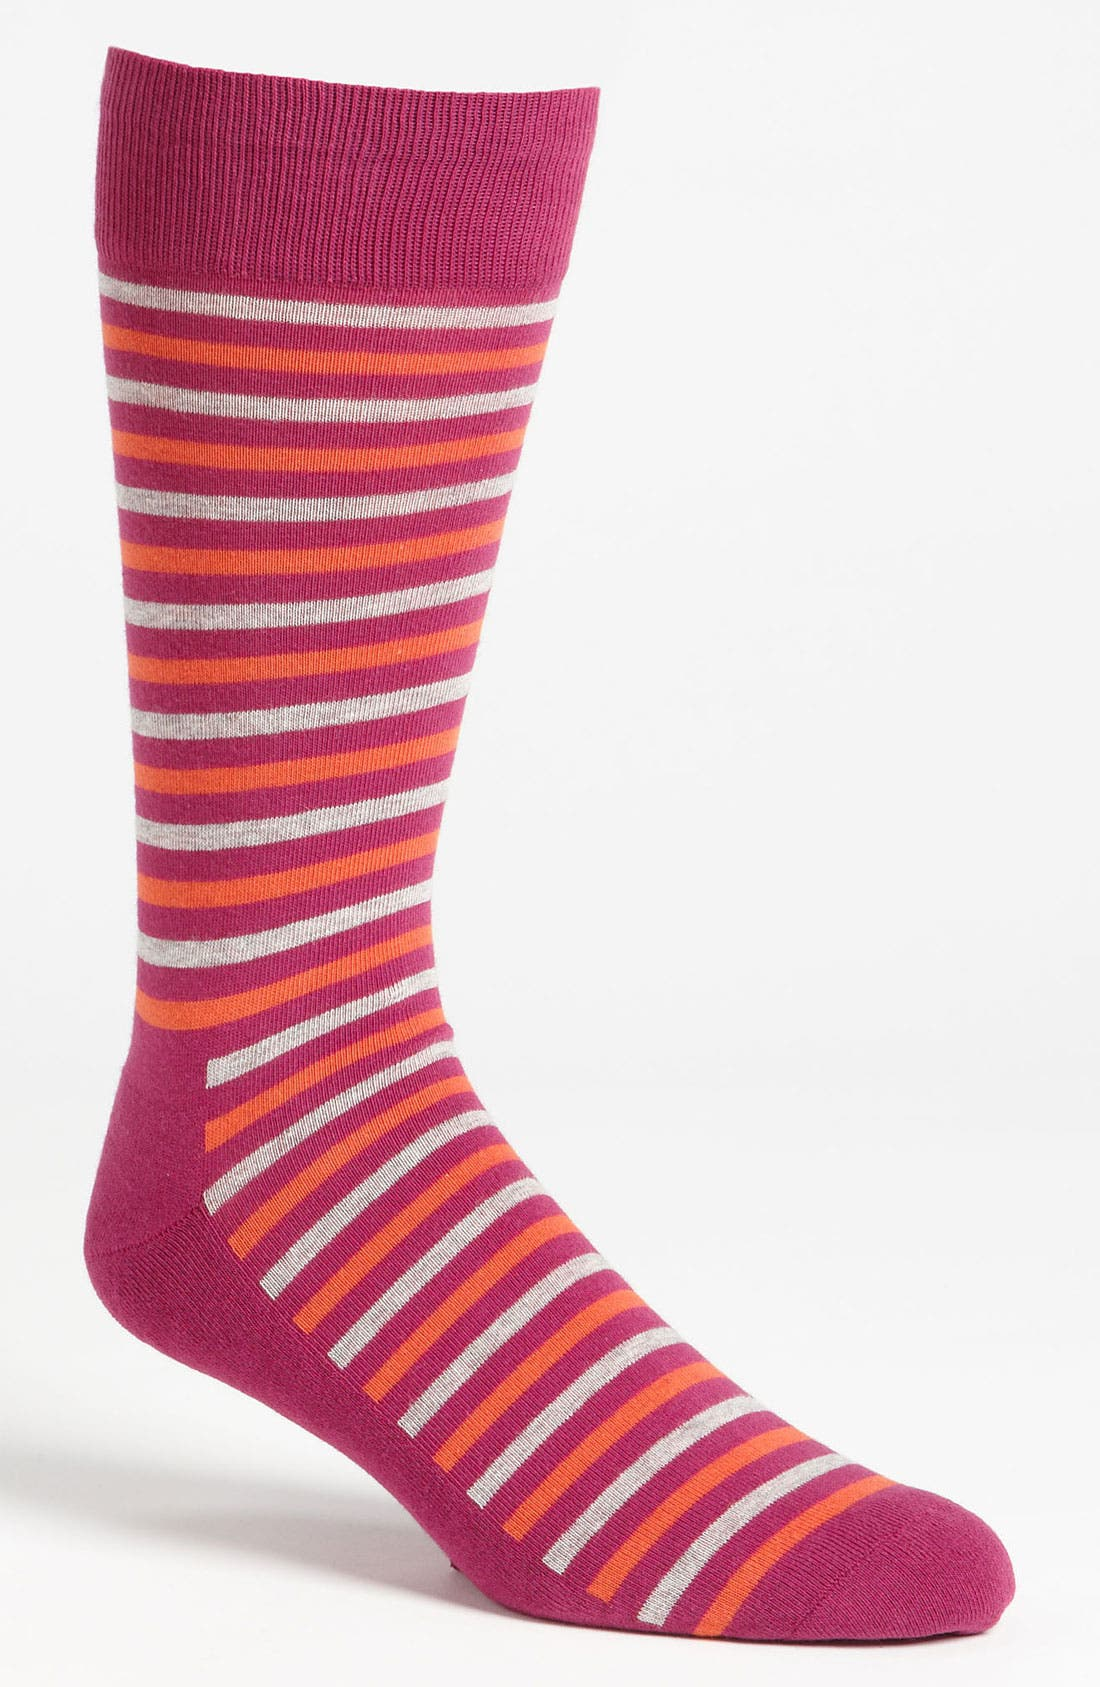 Alternate Image 1 Selected - Vince Camuto 'Bold Stripes' Socks